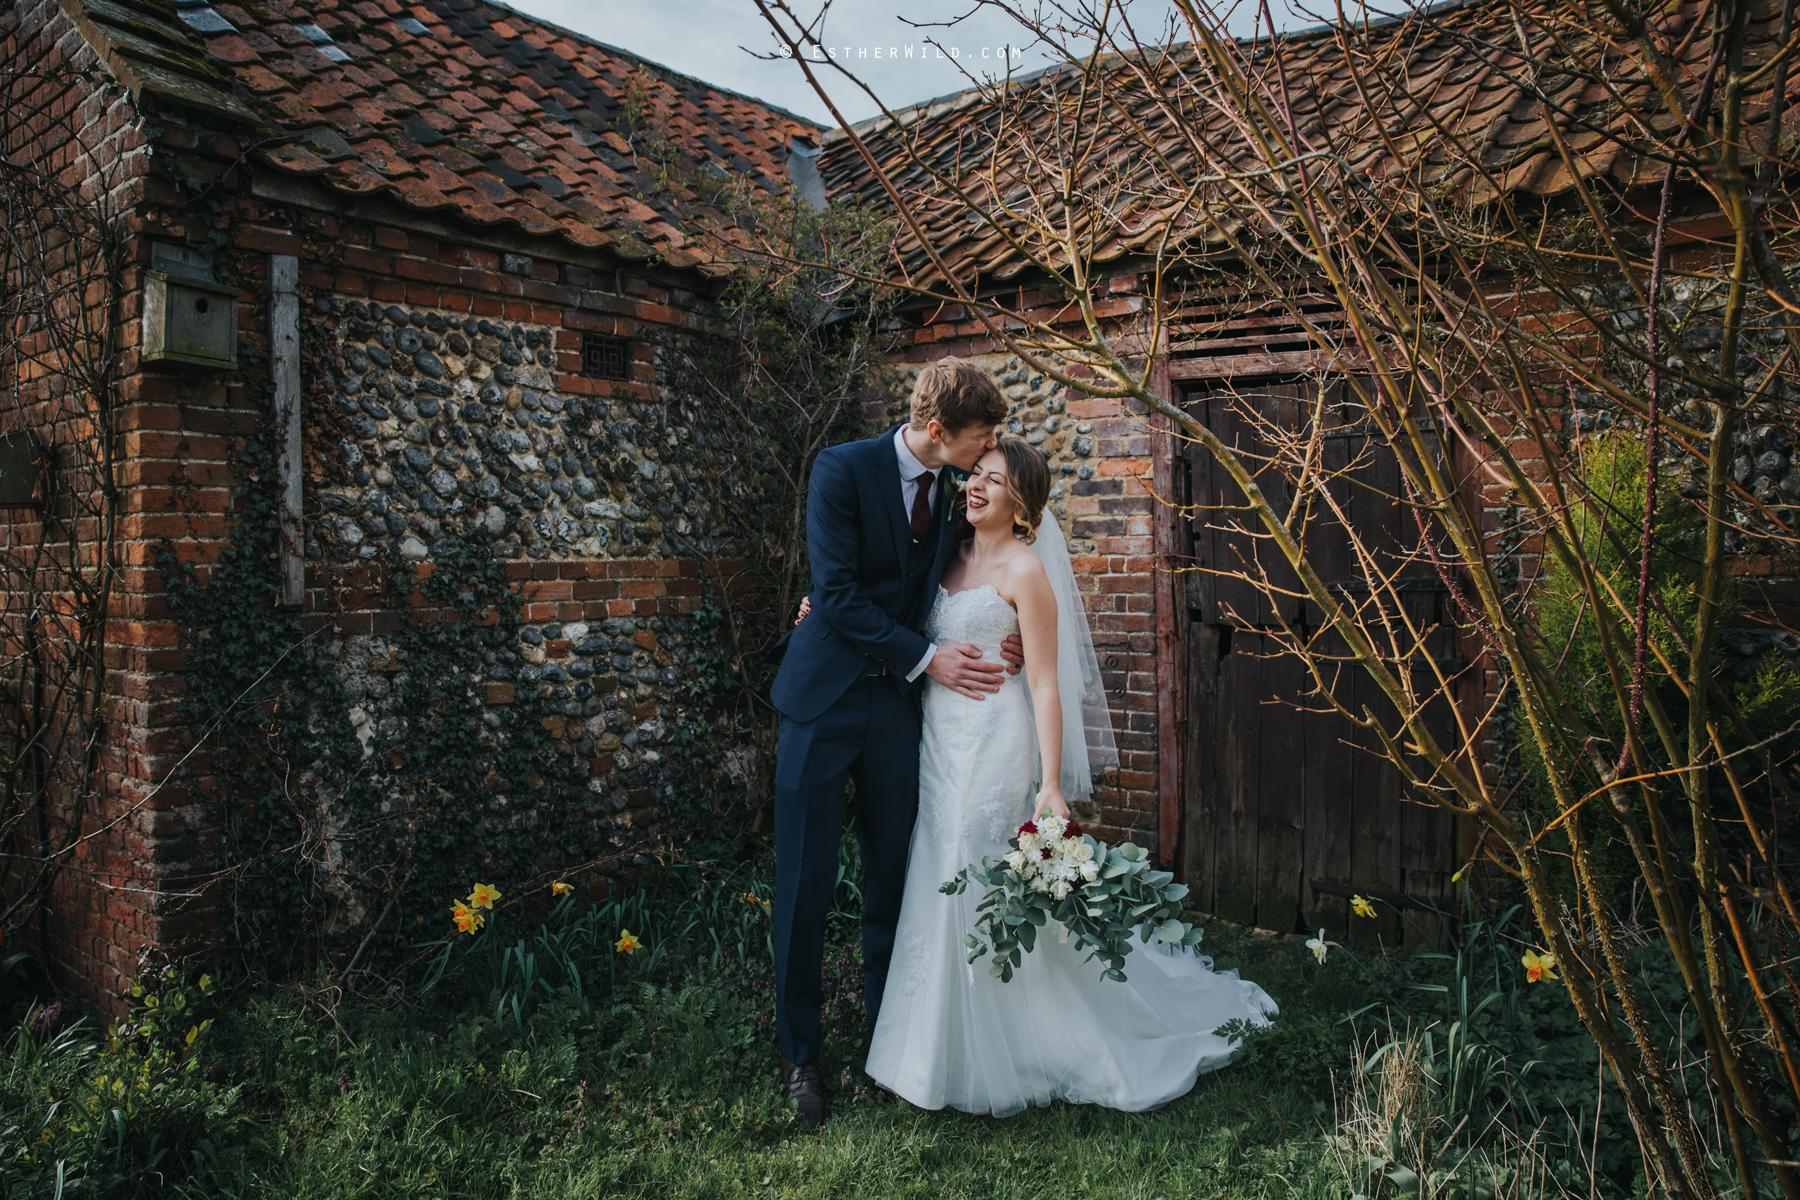 Glebe_Farm_Barn_Rustic_Norfolk_Wedding_Esther_Wild_Photographer_Copyright_IMG_1661.jpg